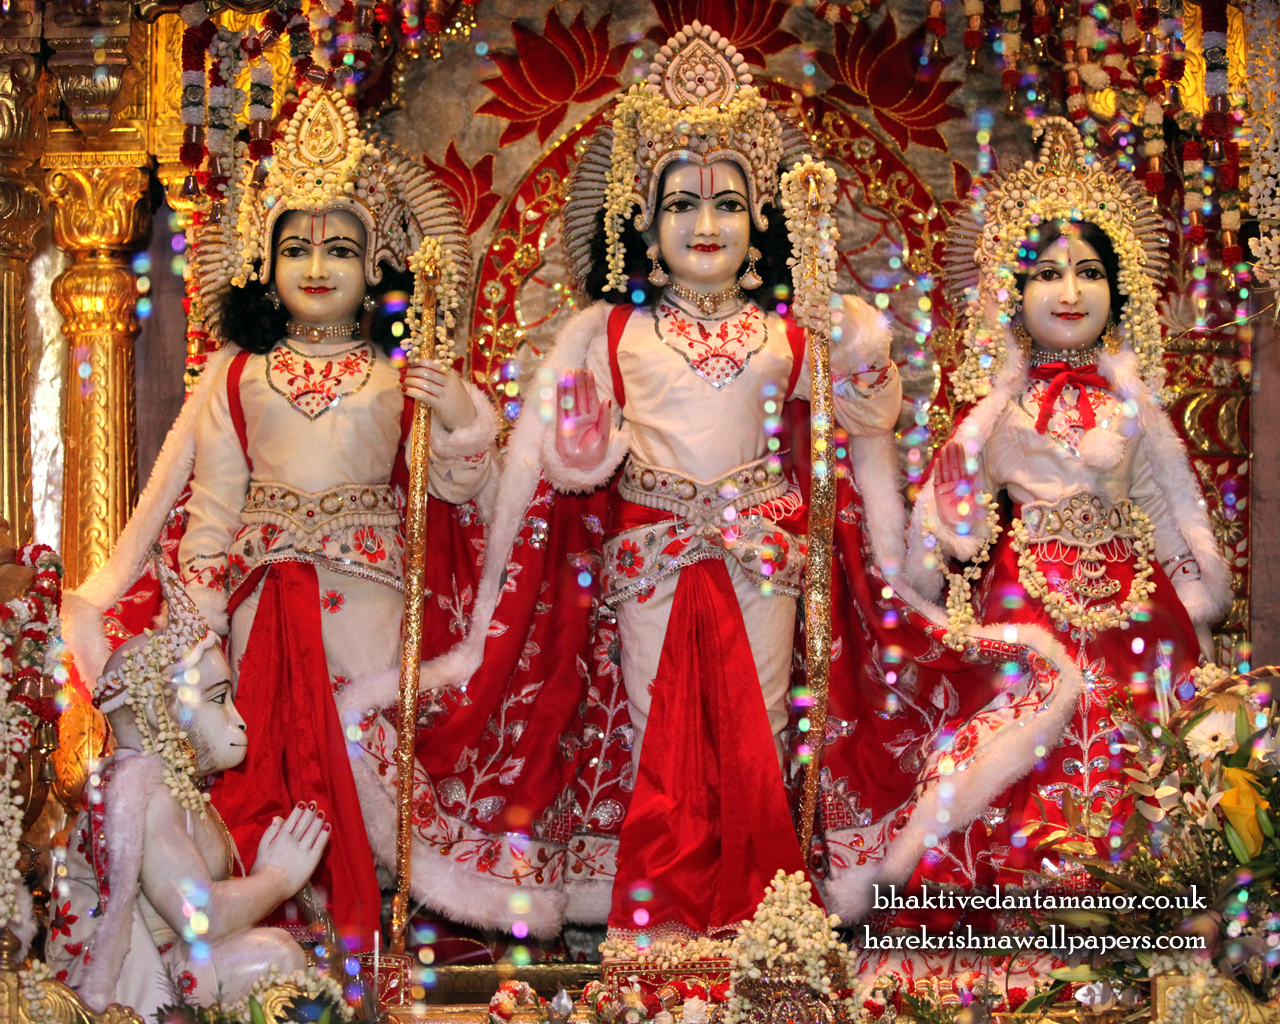 Sri Sri Sita Rama Laxman Hanuman Wallpaper (010) Size 1280x1024 Download